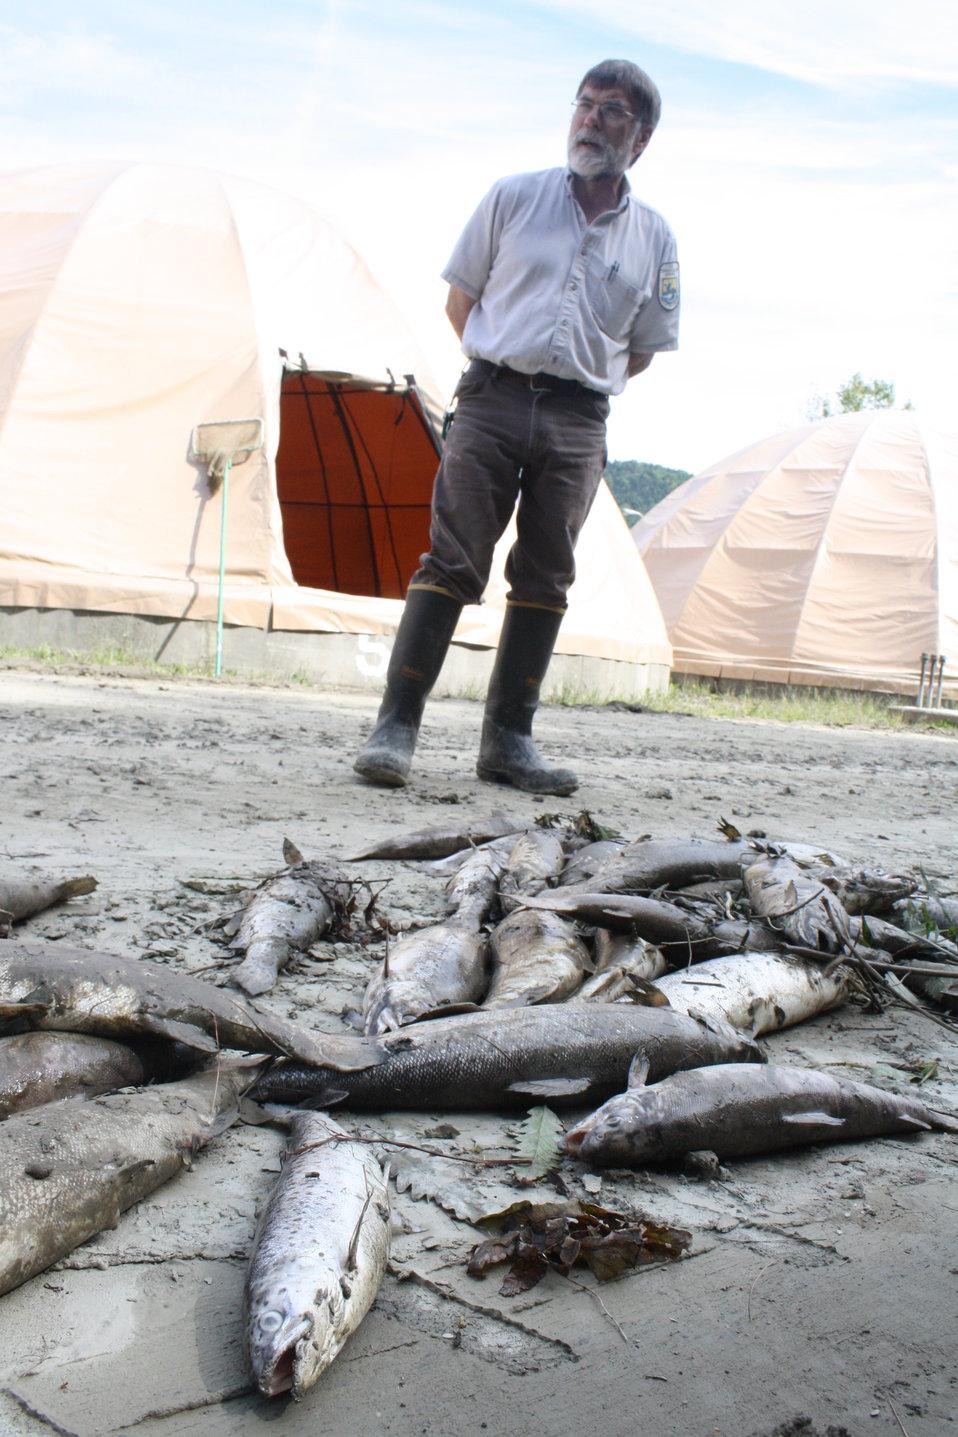 Dead fish, sediment after Hurricane Irene flood event